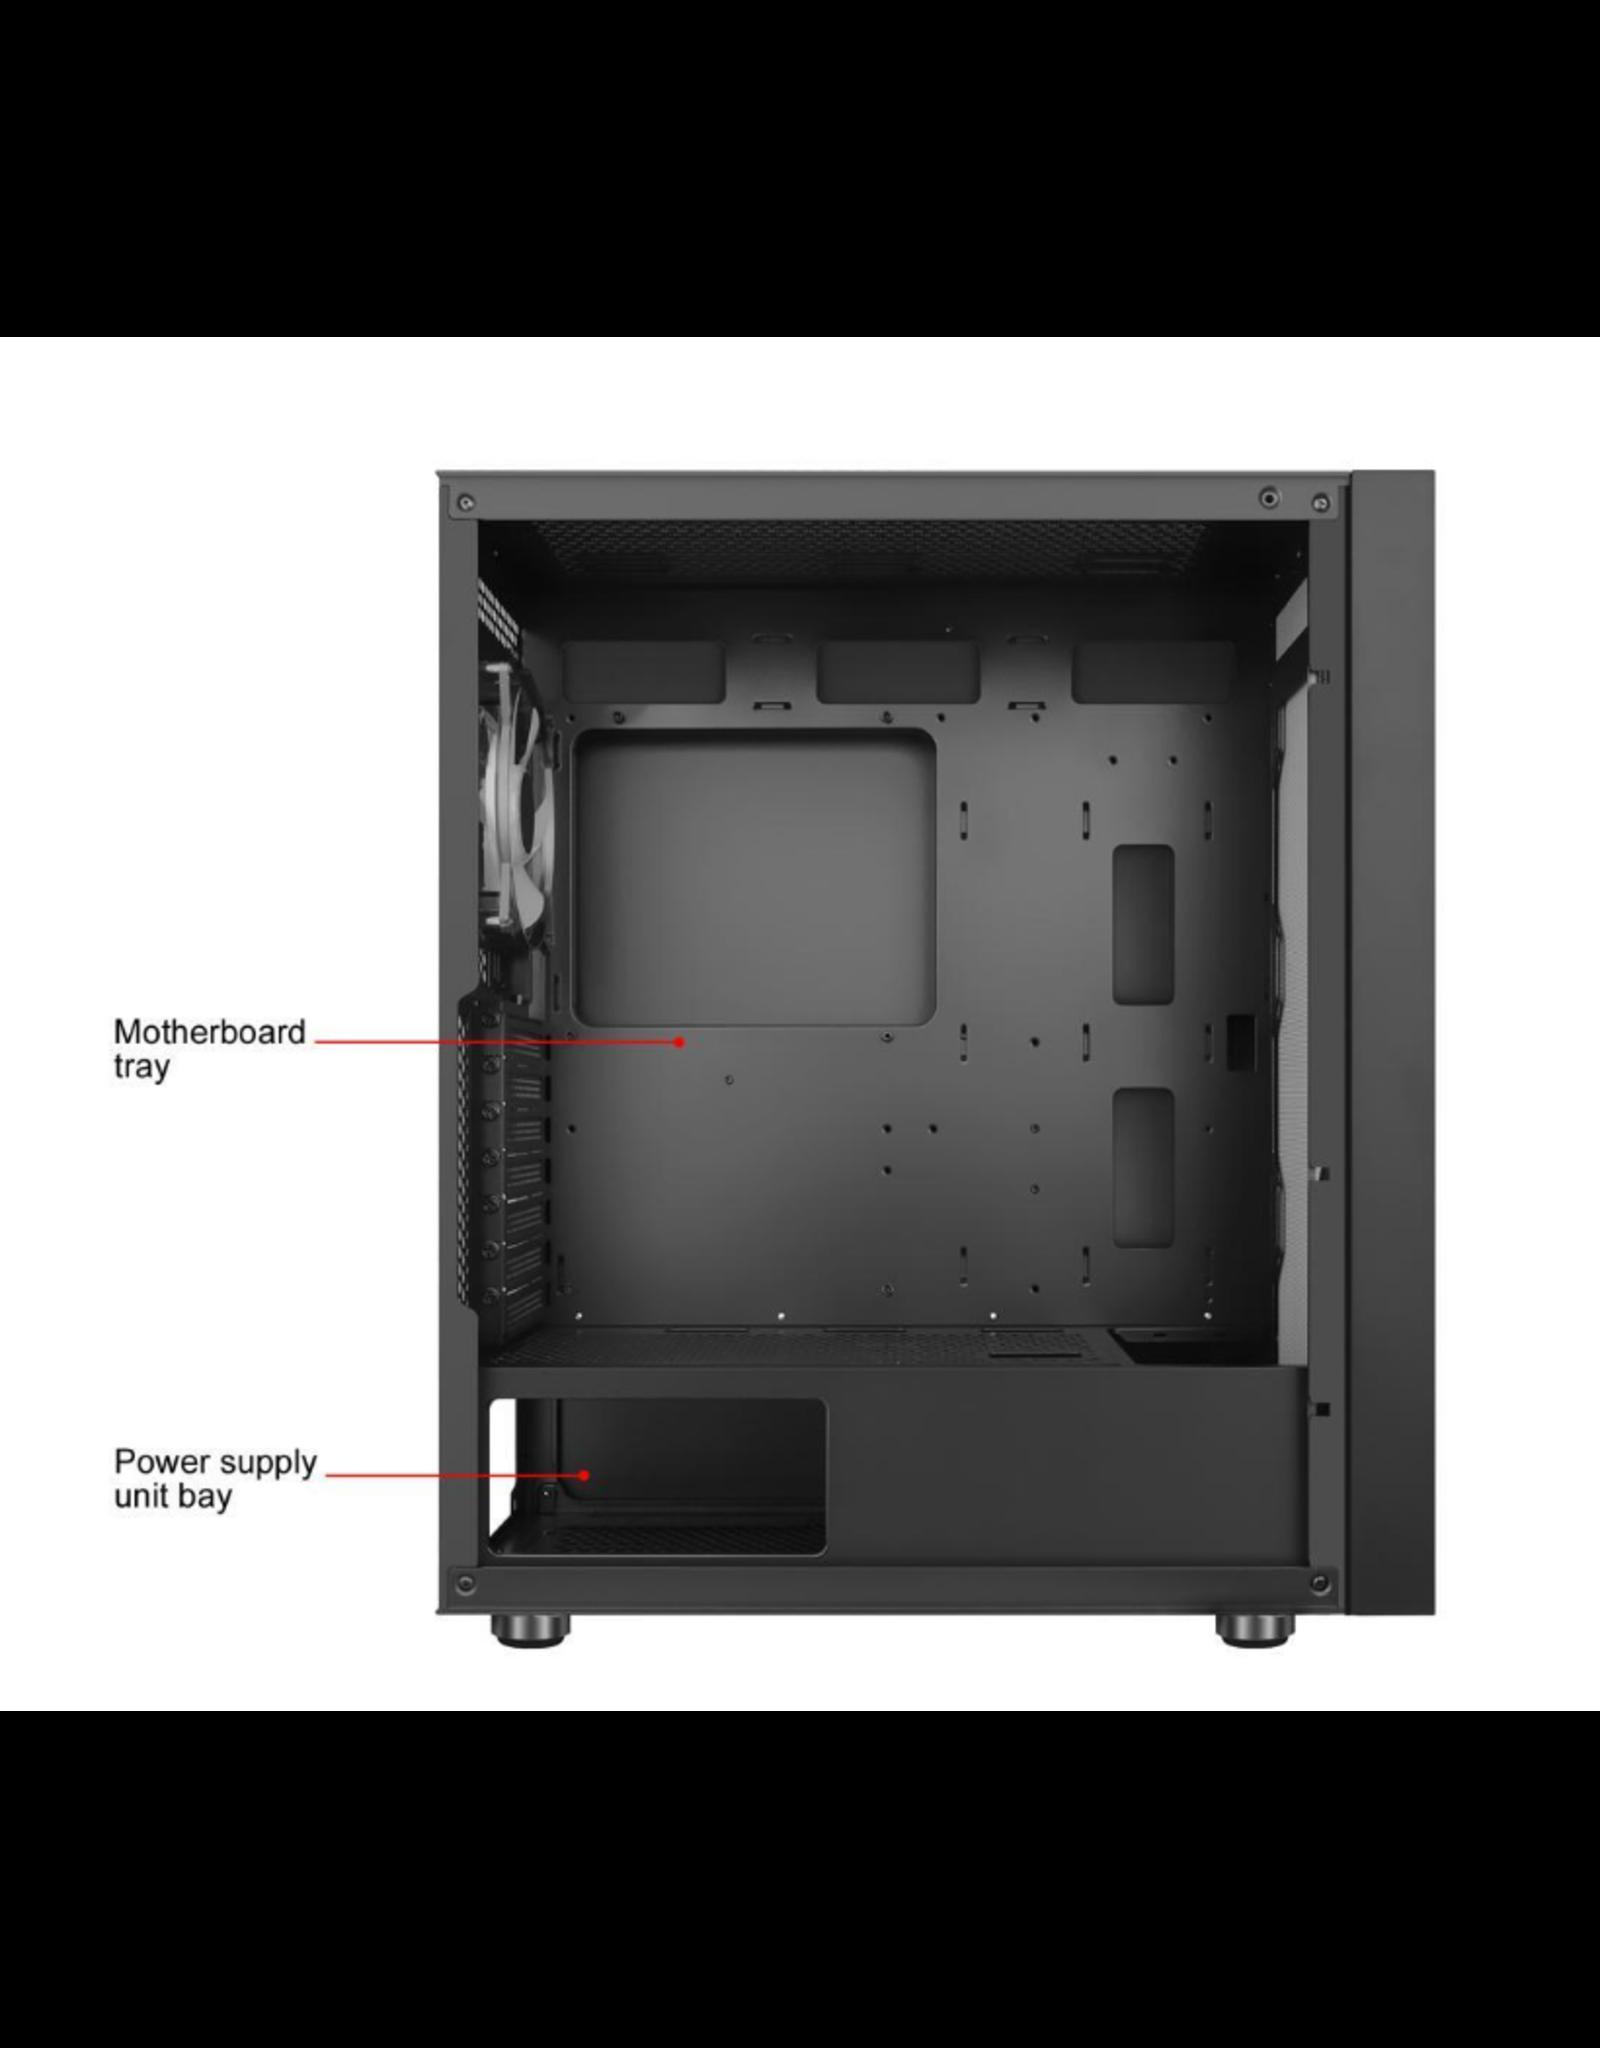 DIYPC DIYPC IDX1-BK-ARGB Black Steel / Tempered Glass ATX Mid Tower Computer Case with 1 x 120mm Halo ARGB LED Fan Pre-Installed